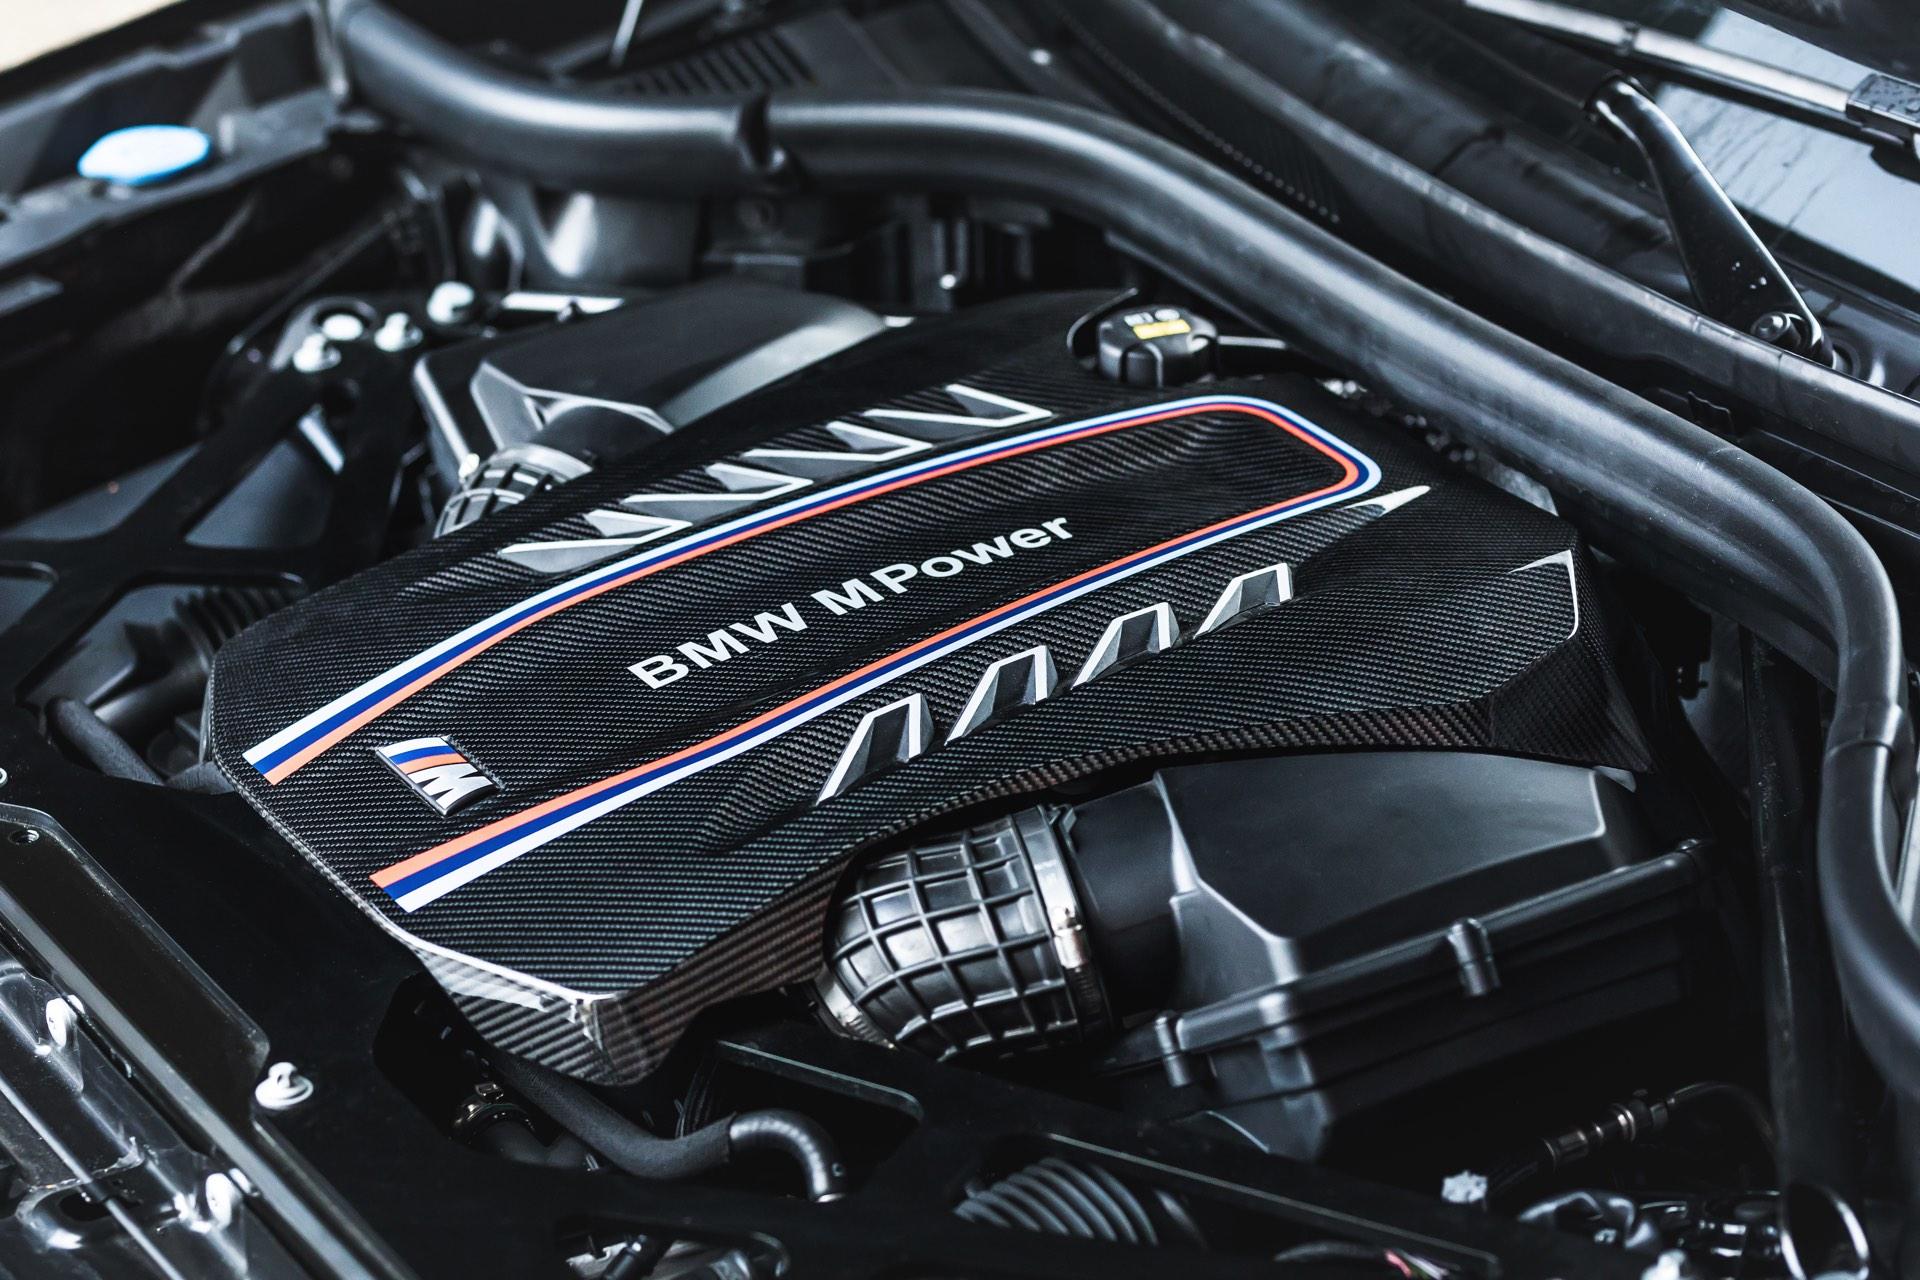 Manhart MHX5 800 BMW X5 M F95 Tuning engine